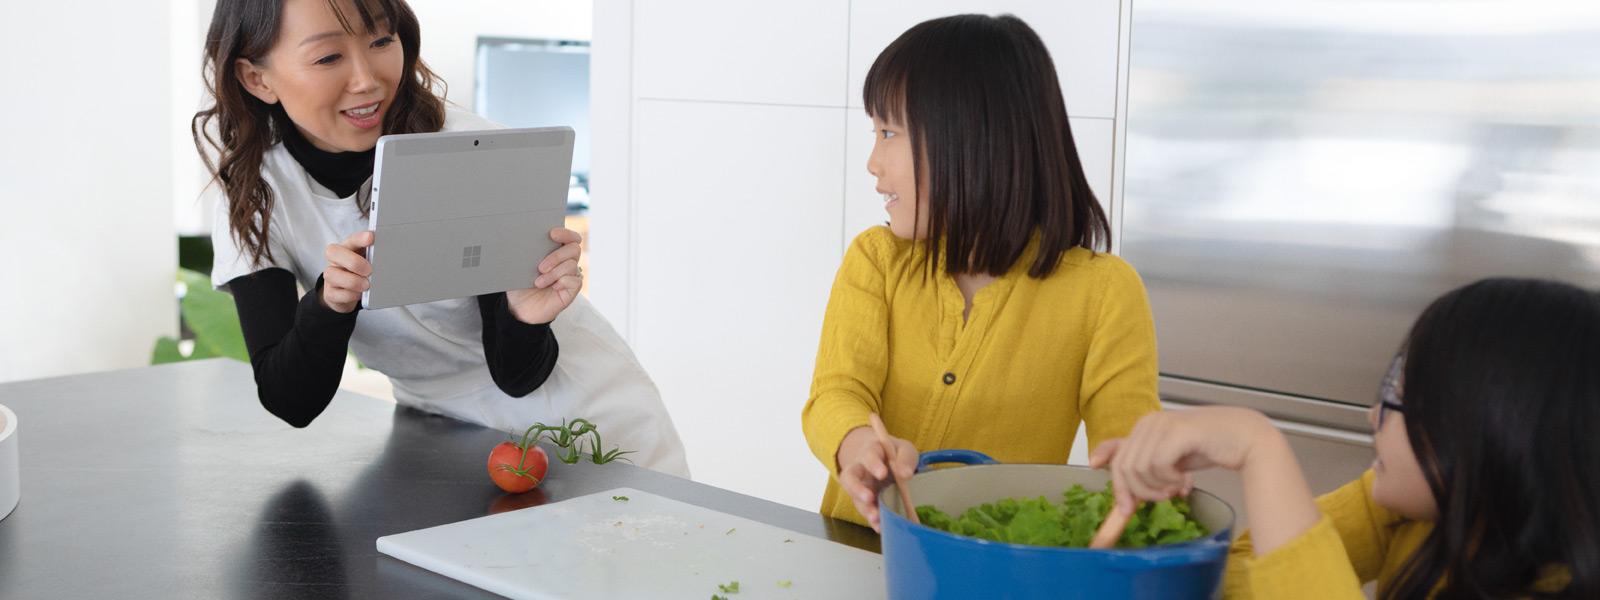 Surface Go로 자녀의 사진을 찍고 있는 여성